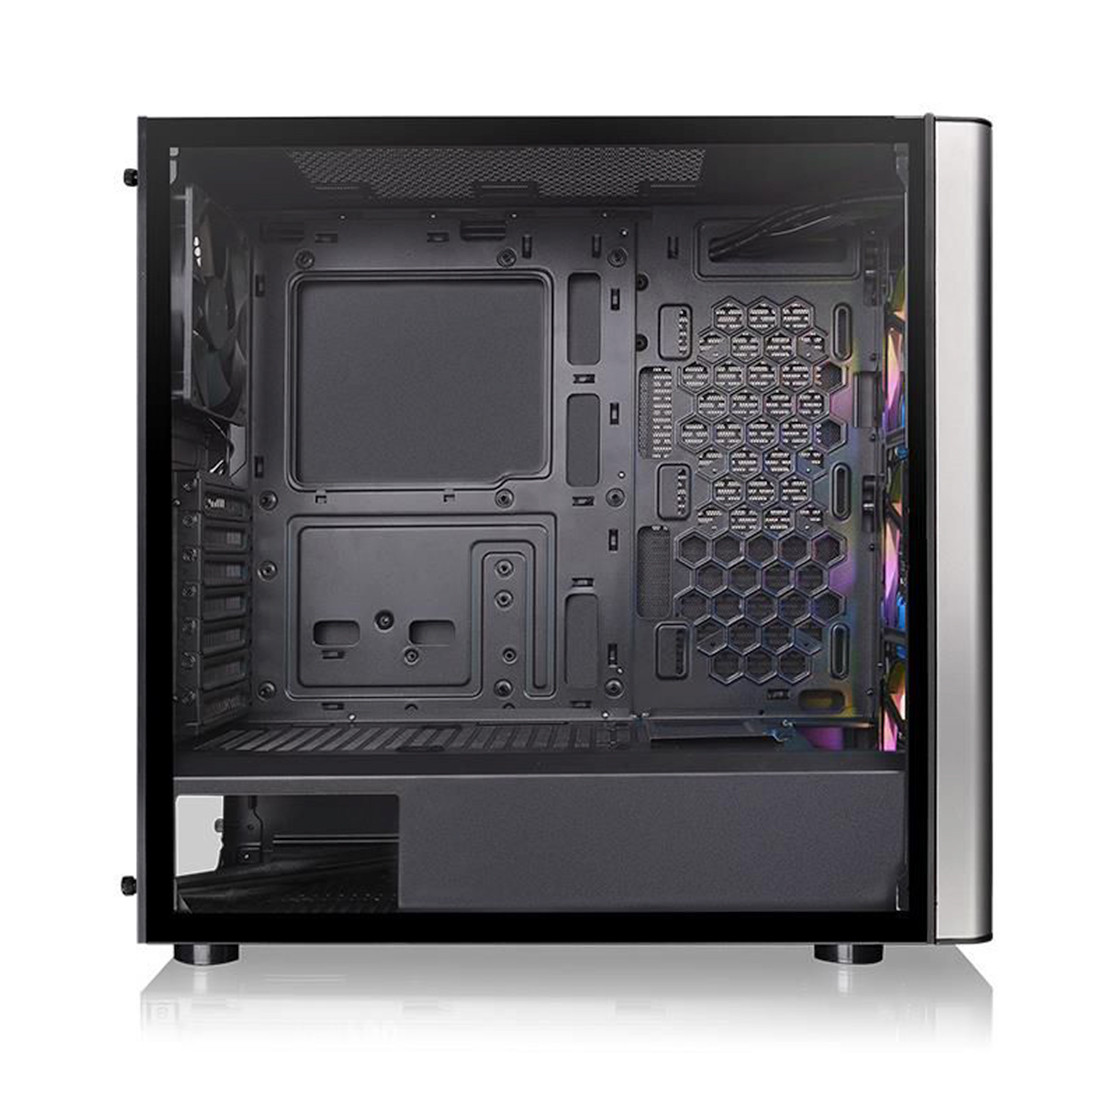 Компьютерный корпус Thermaltake Level 20 MT ARGB без Б/П